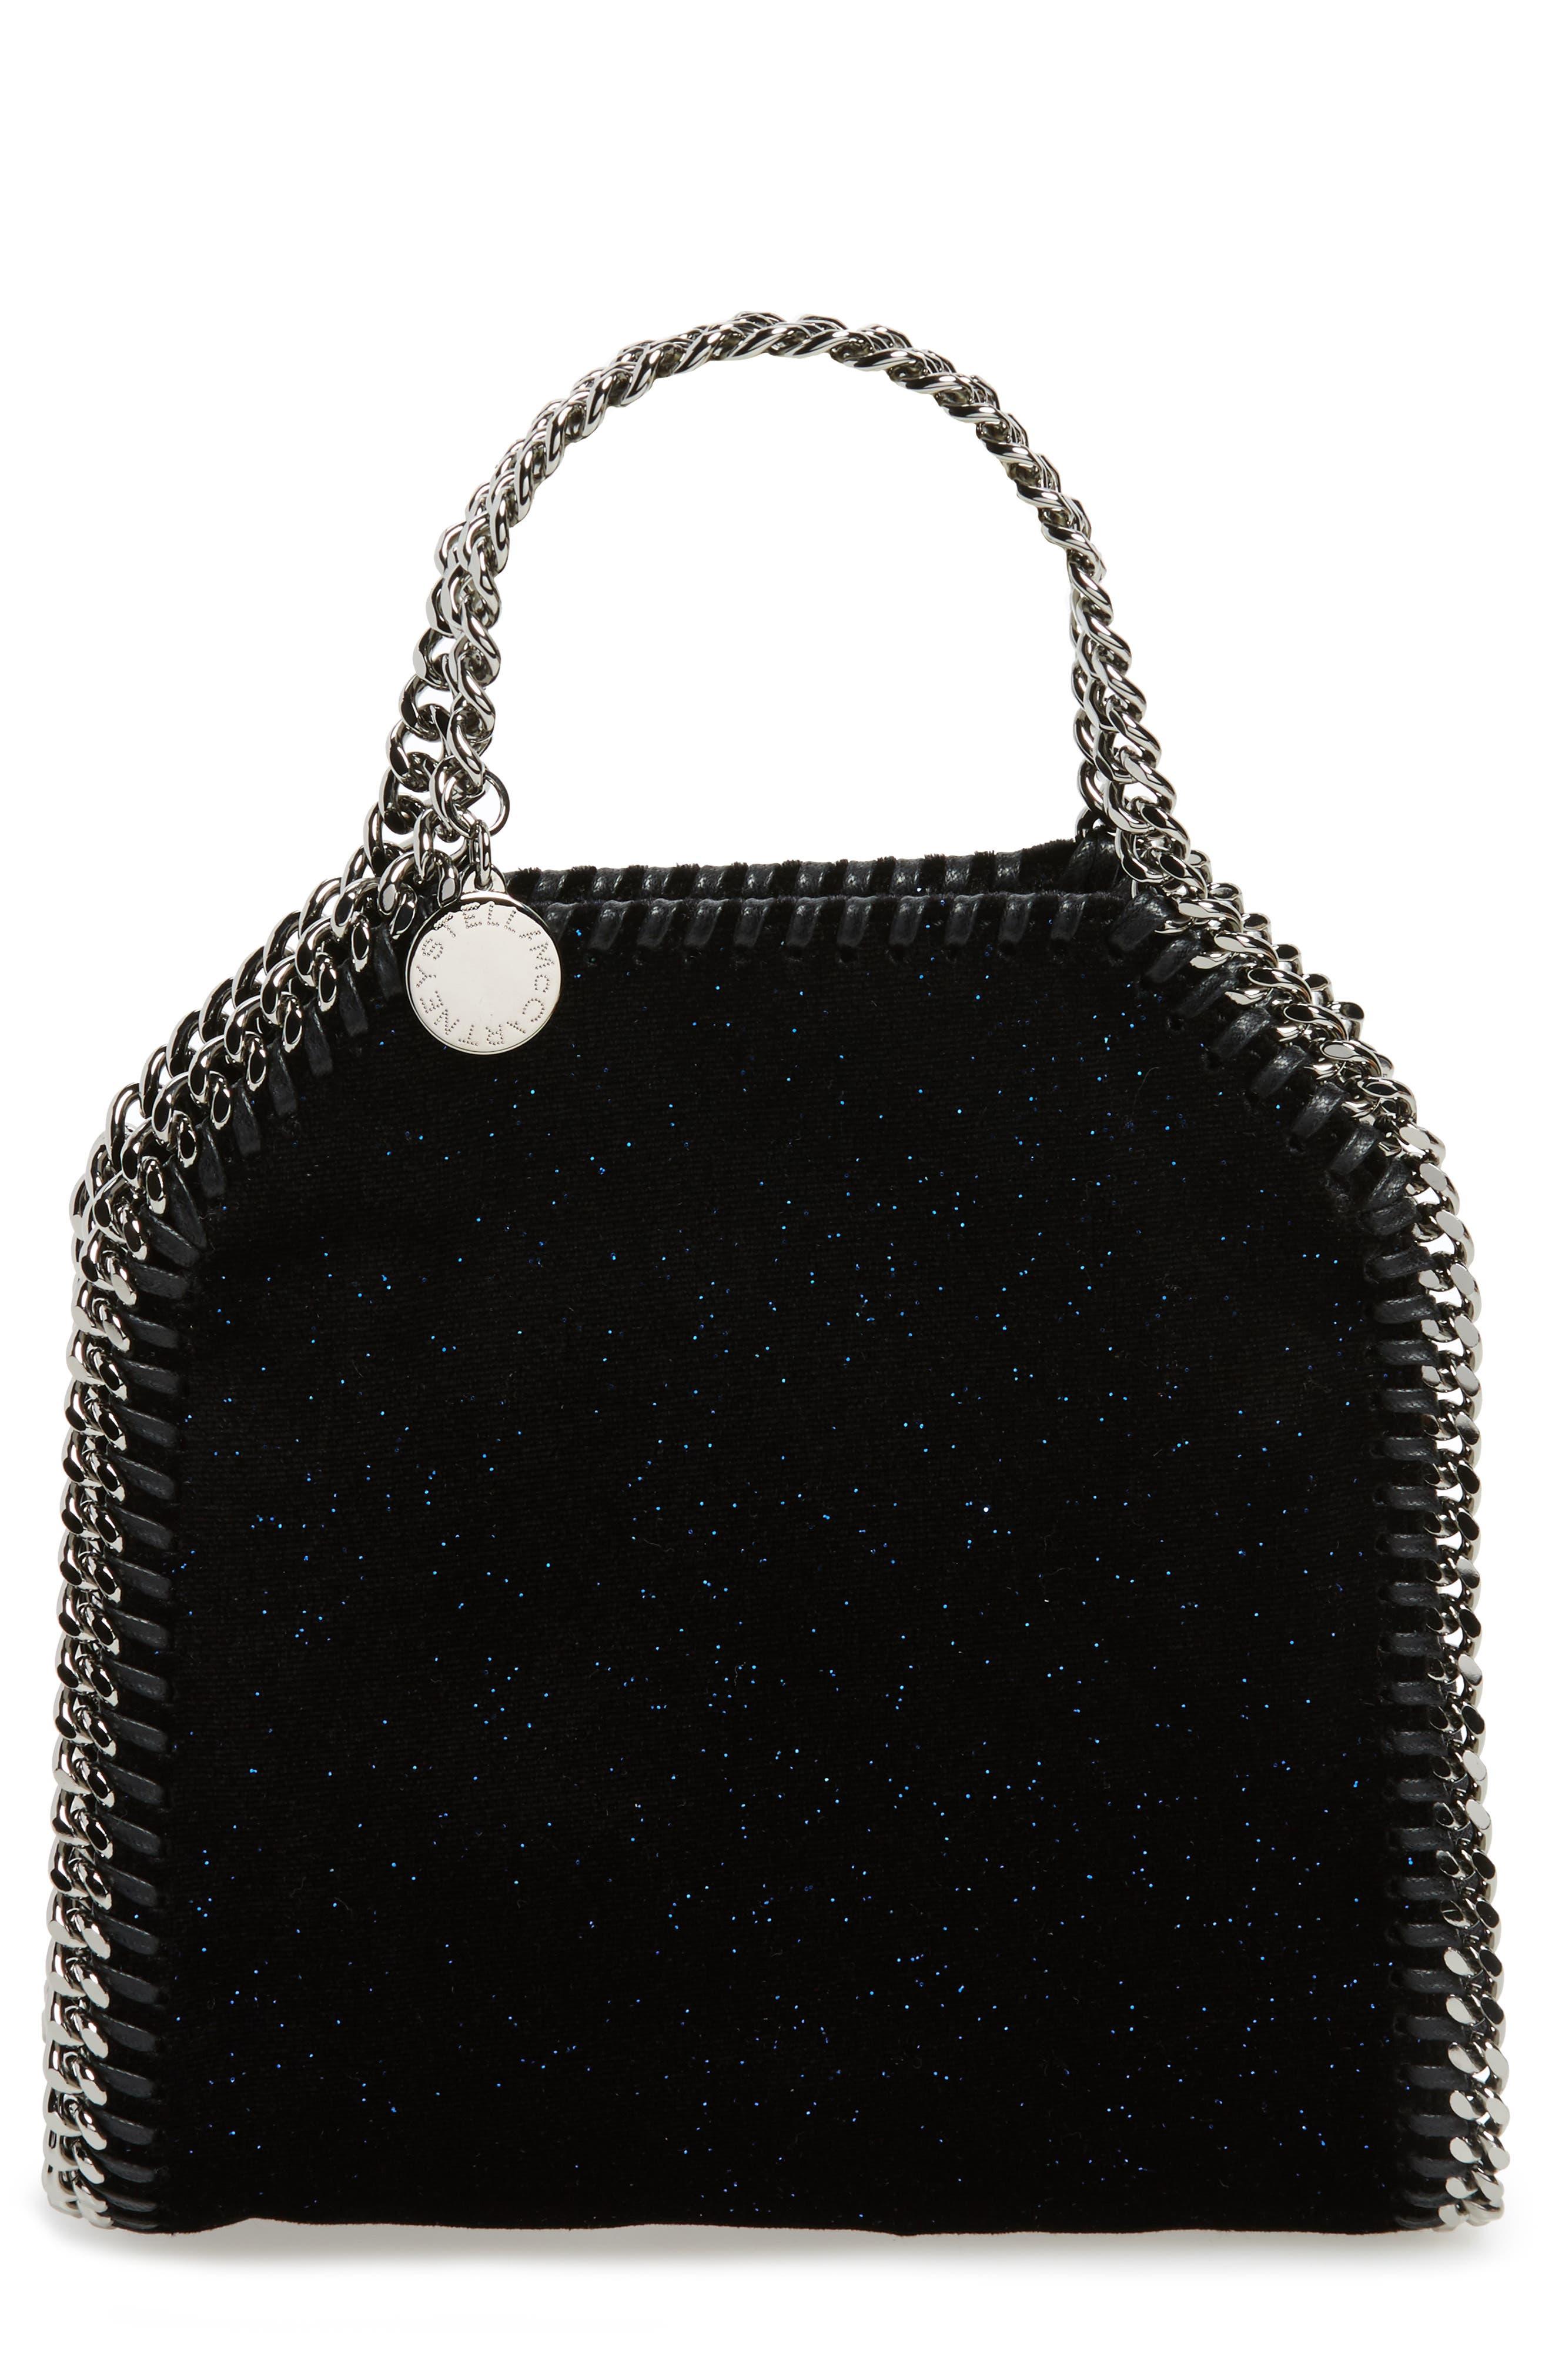 STELLA MCCARTNEY Tiny Falabella Glitter Crossbody Bag